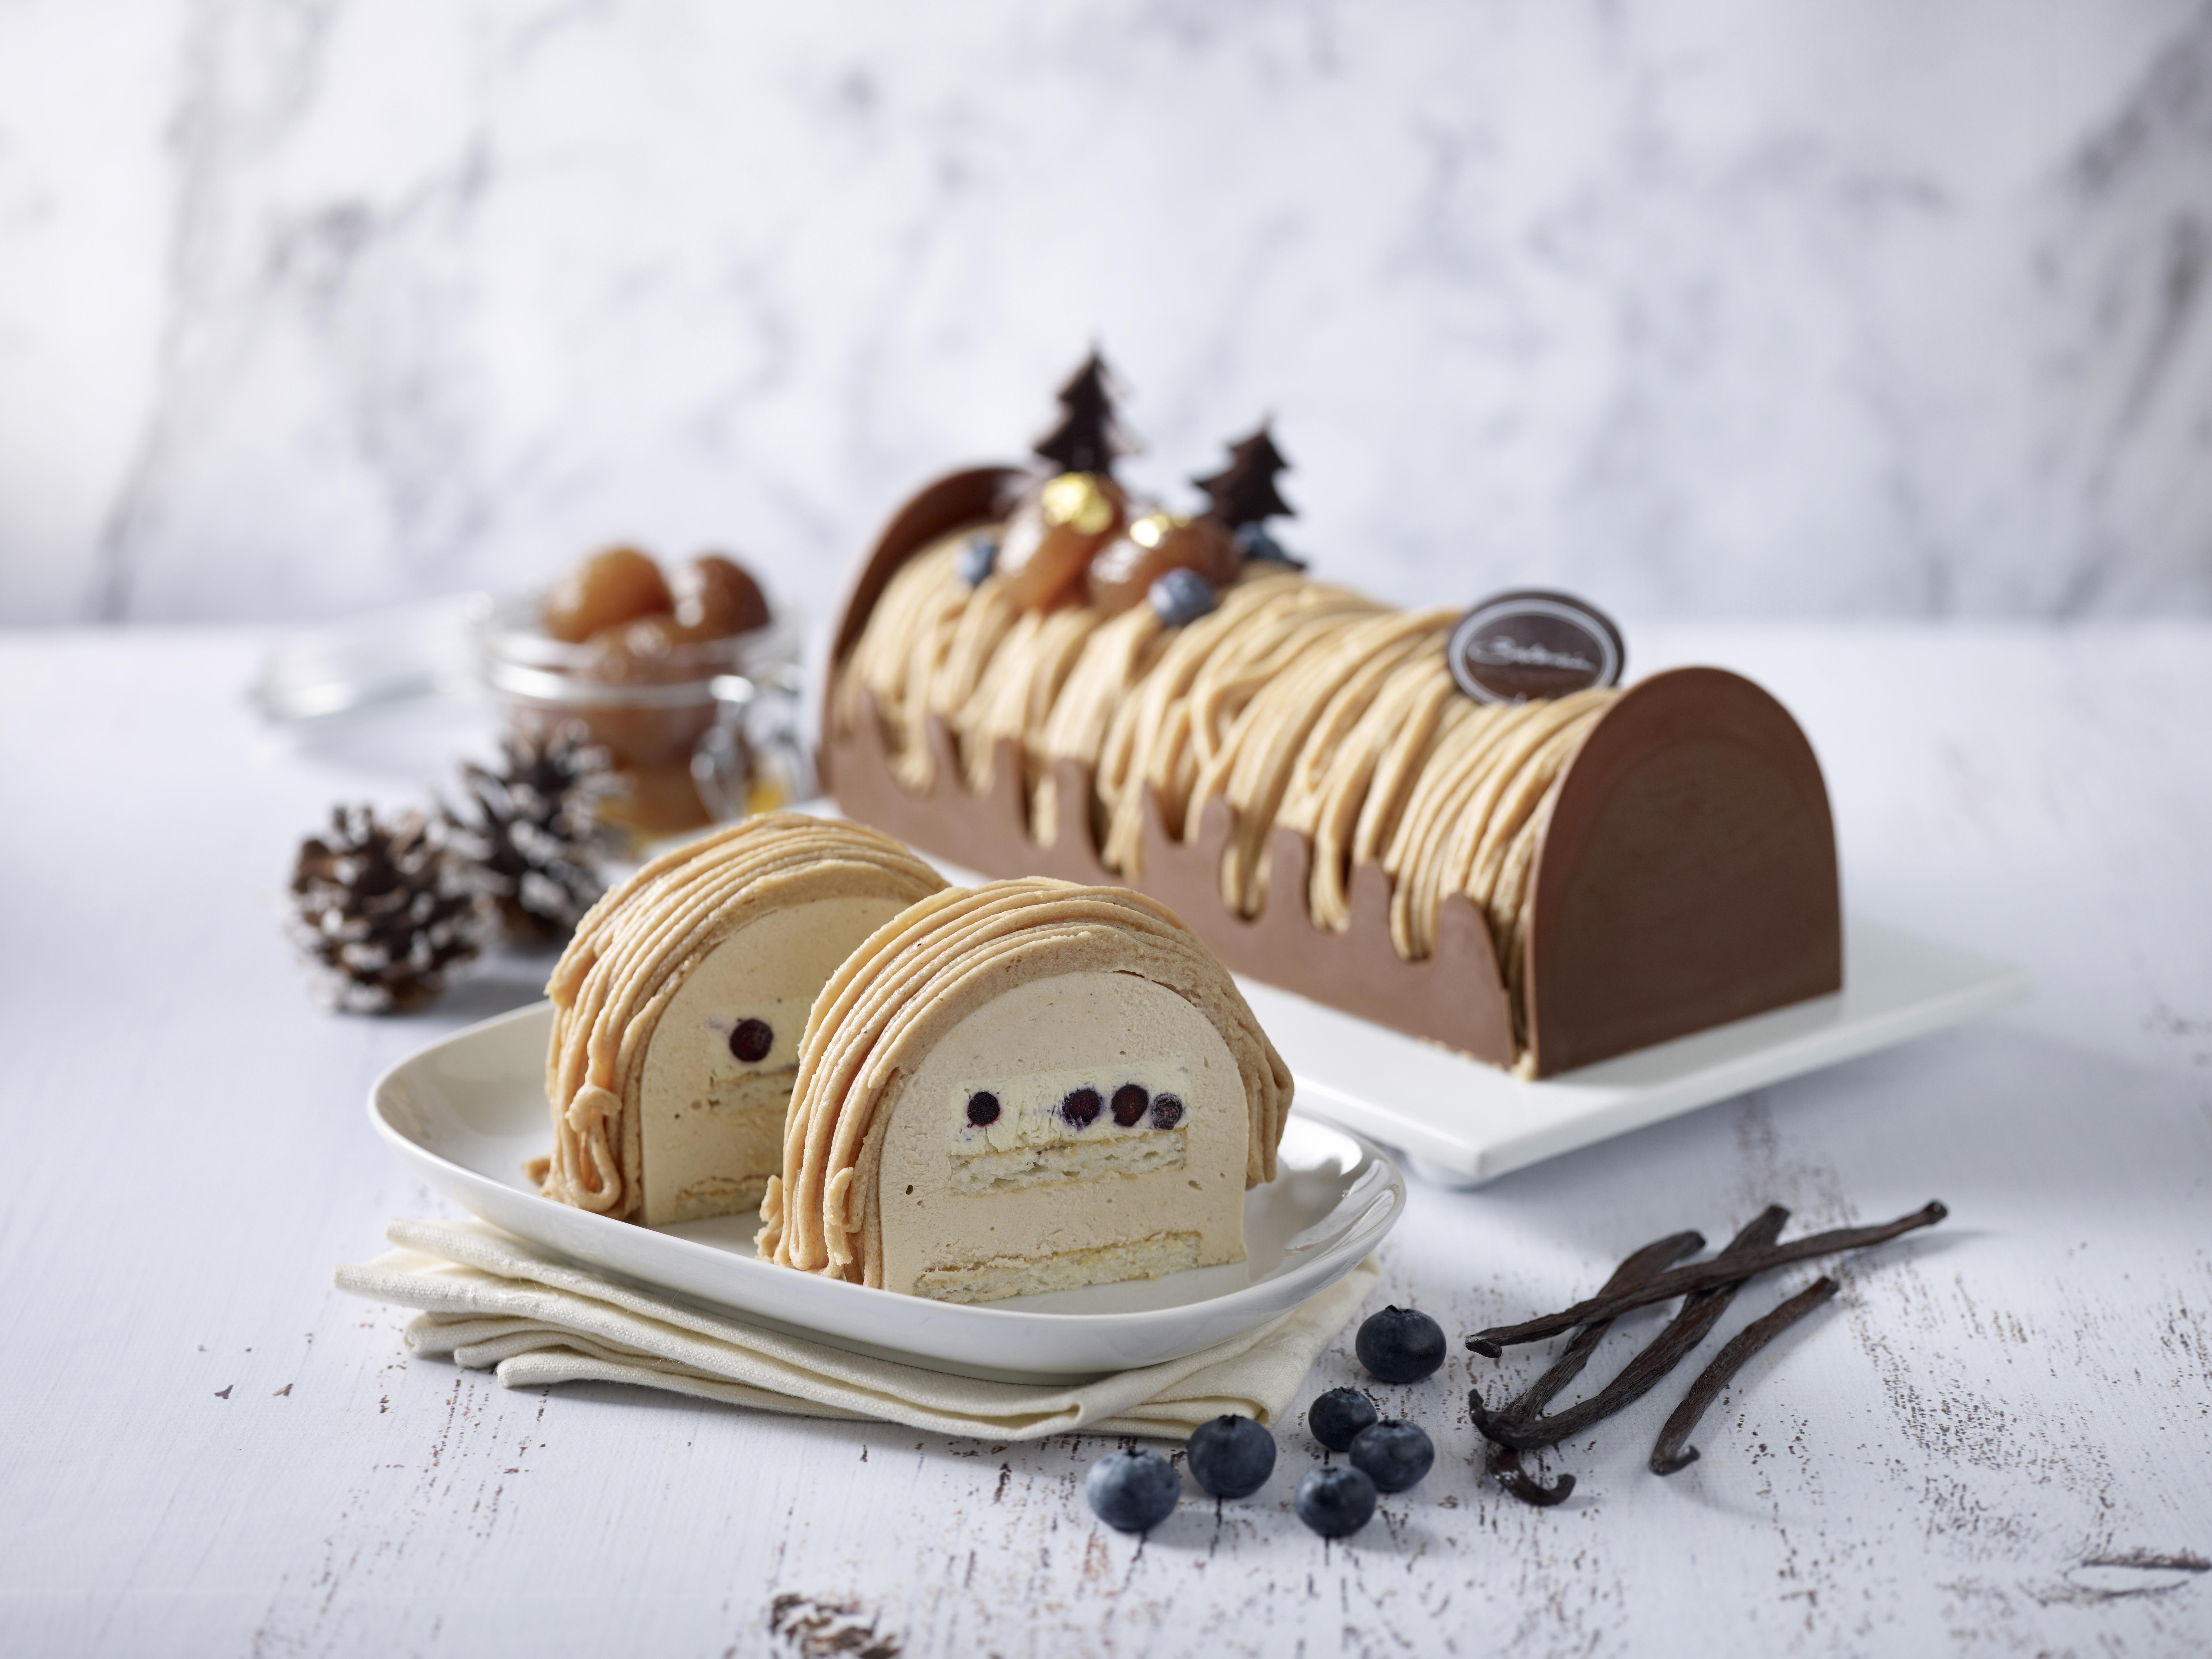 xmas-bakerzinn-gateau-mont-blanc-logcake